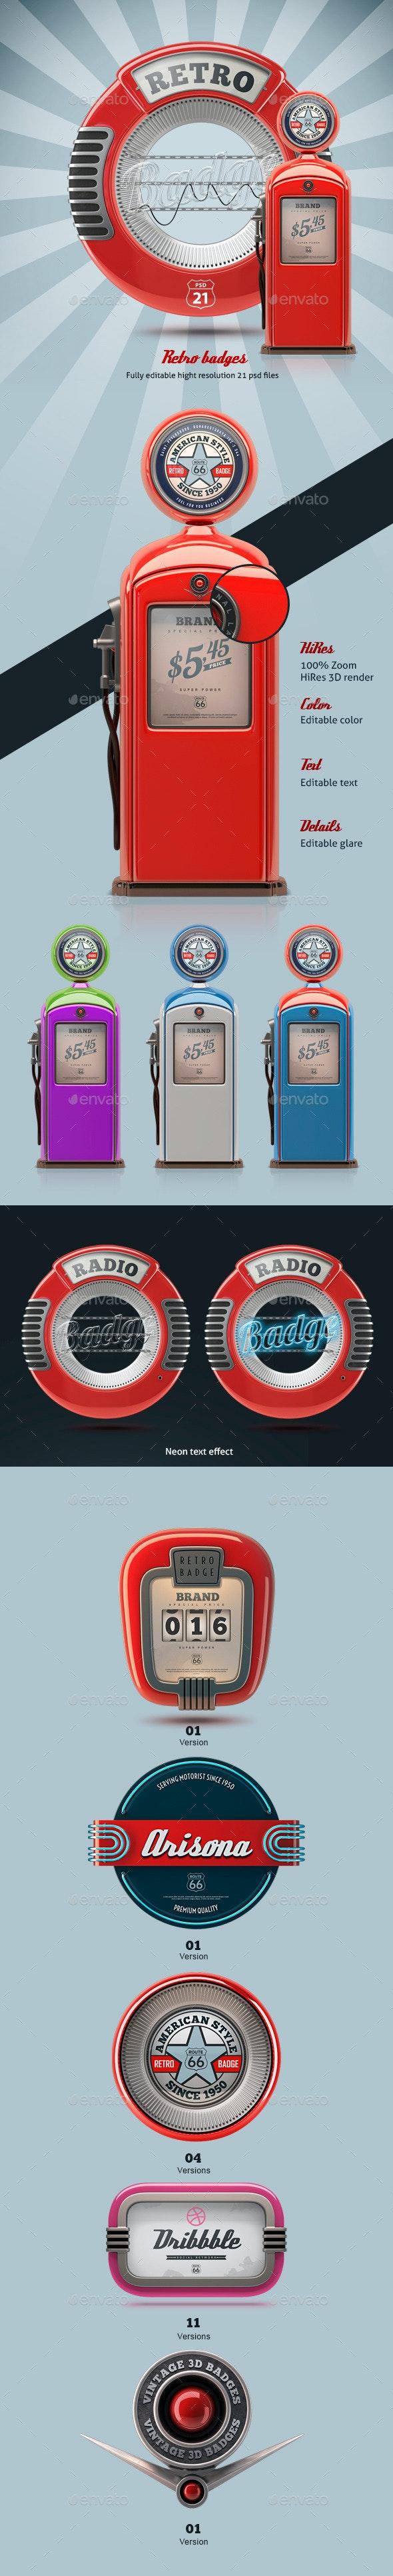 3D Retro Badges - Badges & Stickers Web Elements